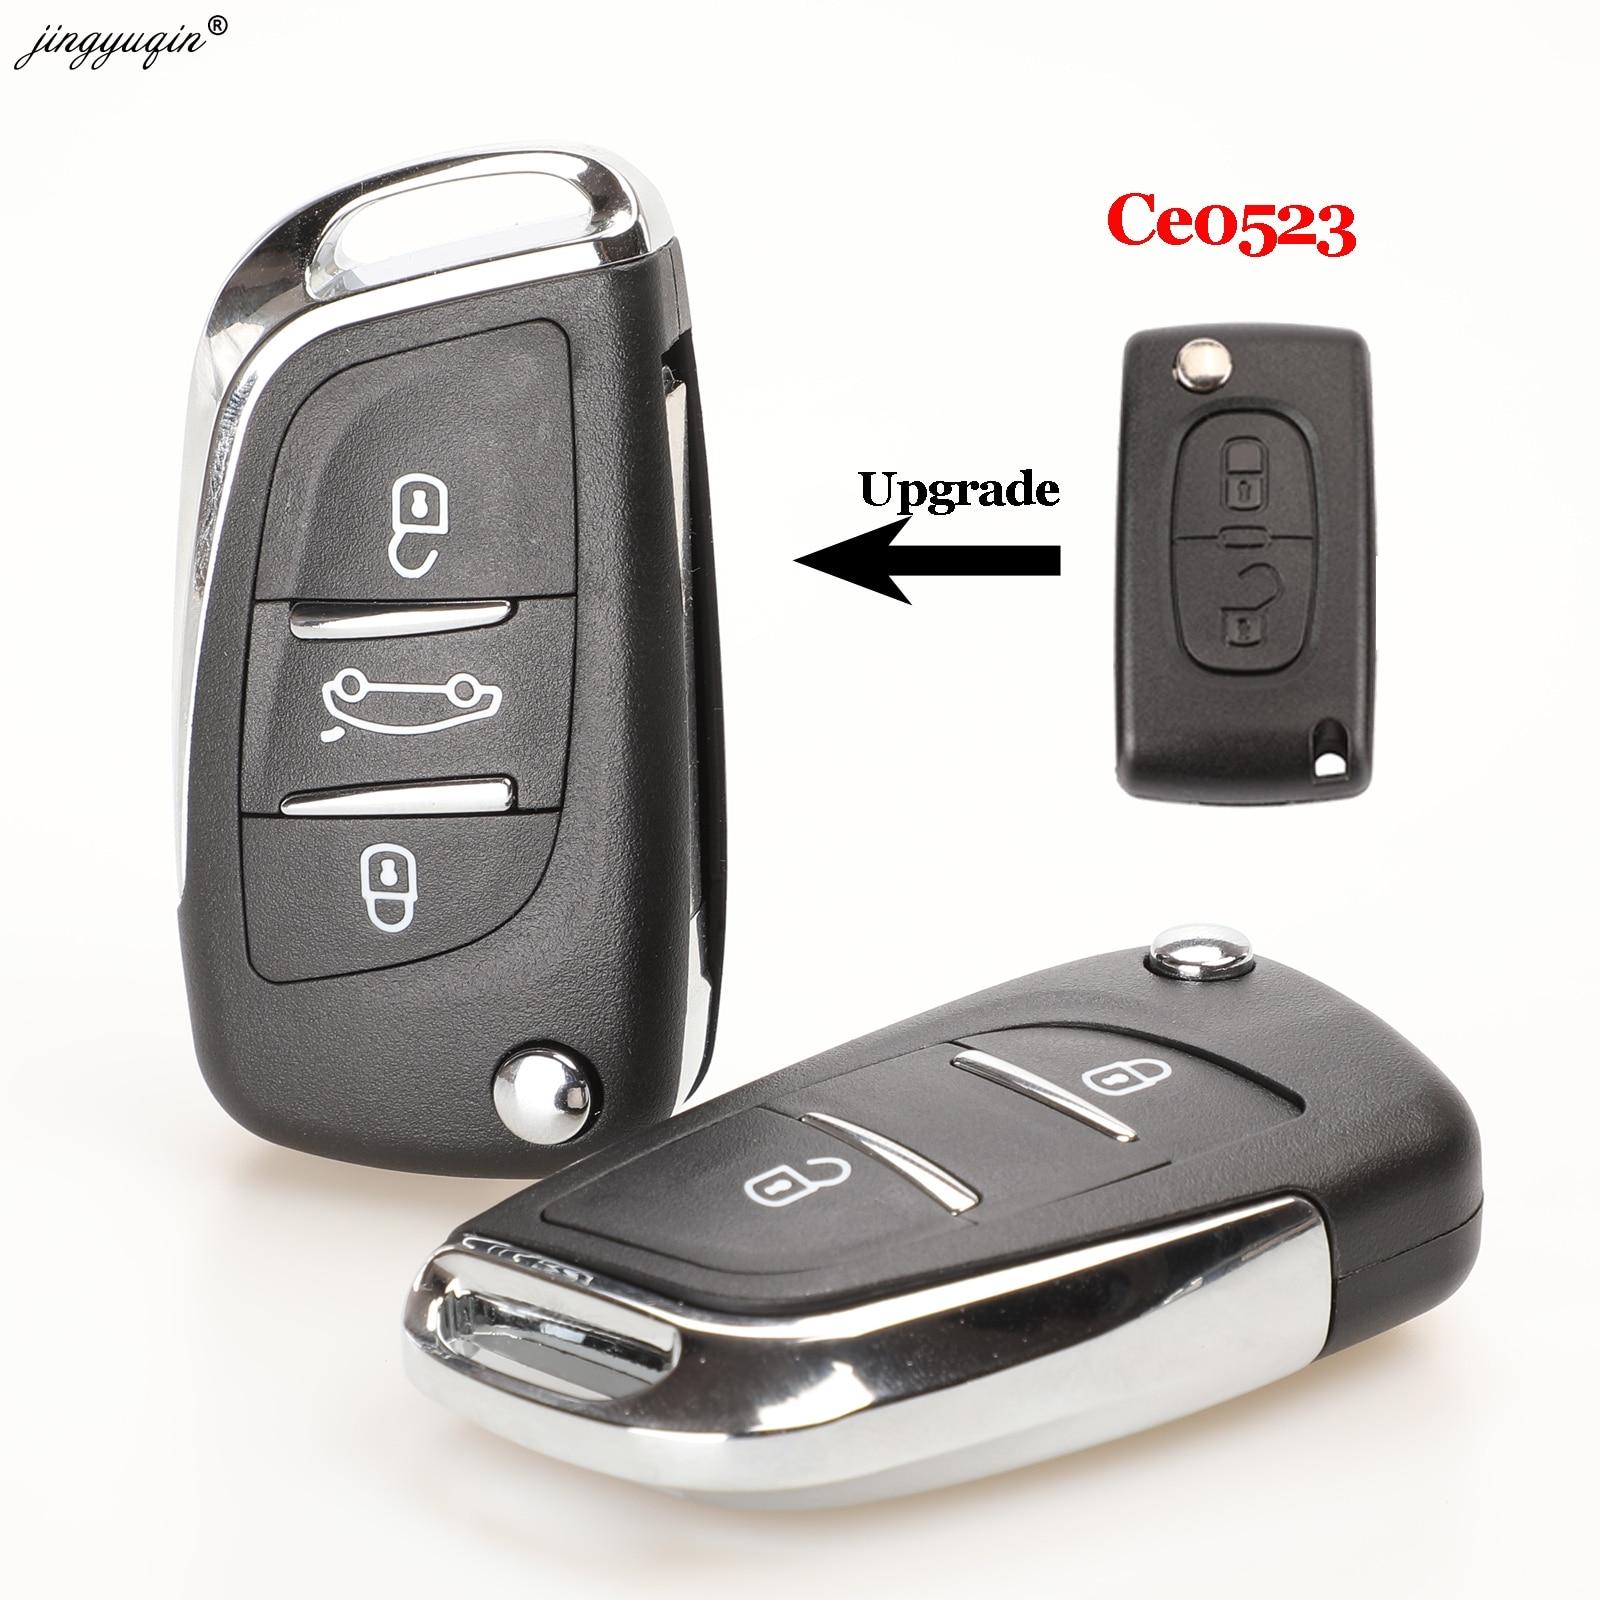 jingyuqin VA2/HU83 2/3B Ce0523 Modified Flip Remote Car Key Shell For Citroen Coupe VTR C2 C4 C5 C6 C8 Berlingo Xsara Picasso